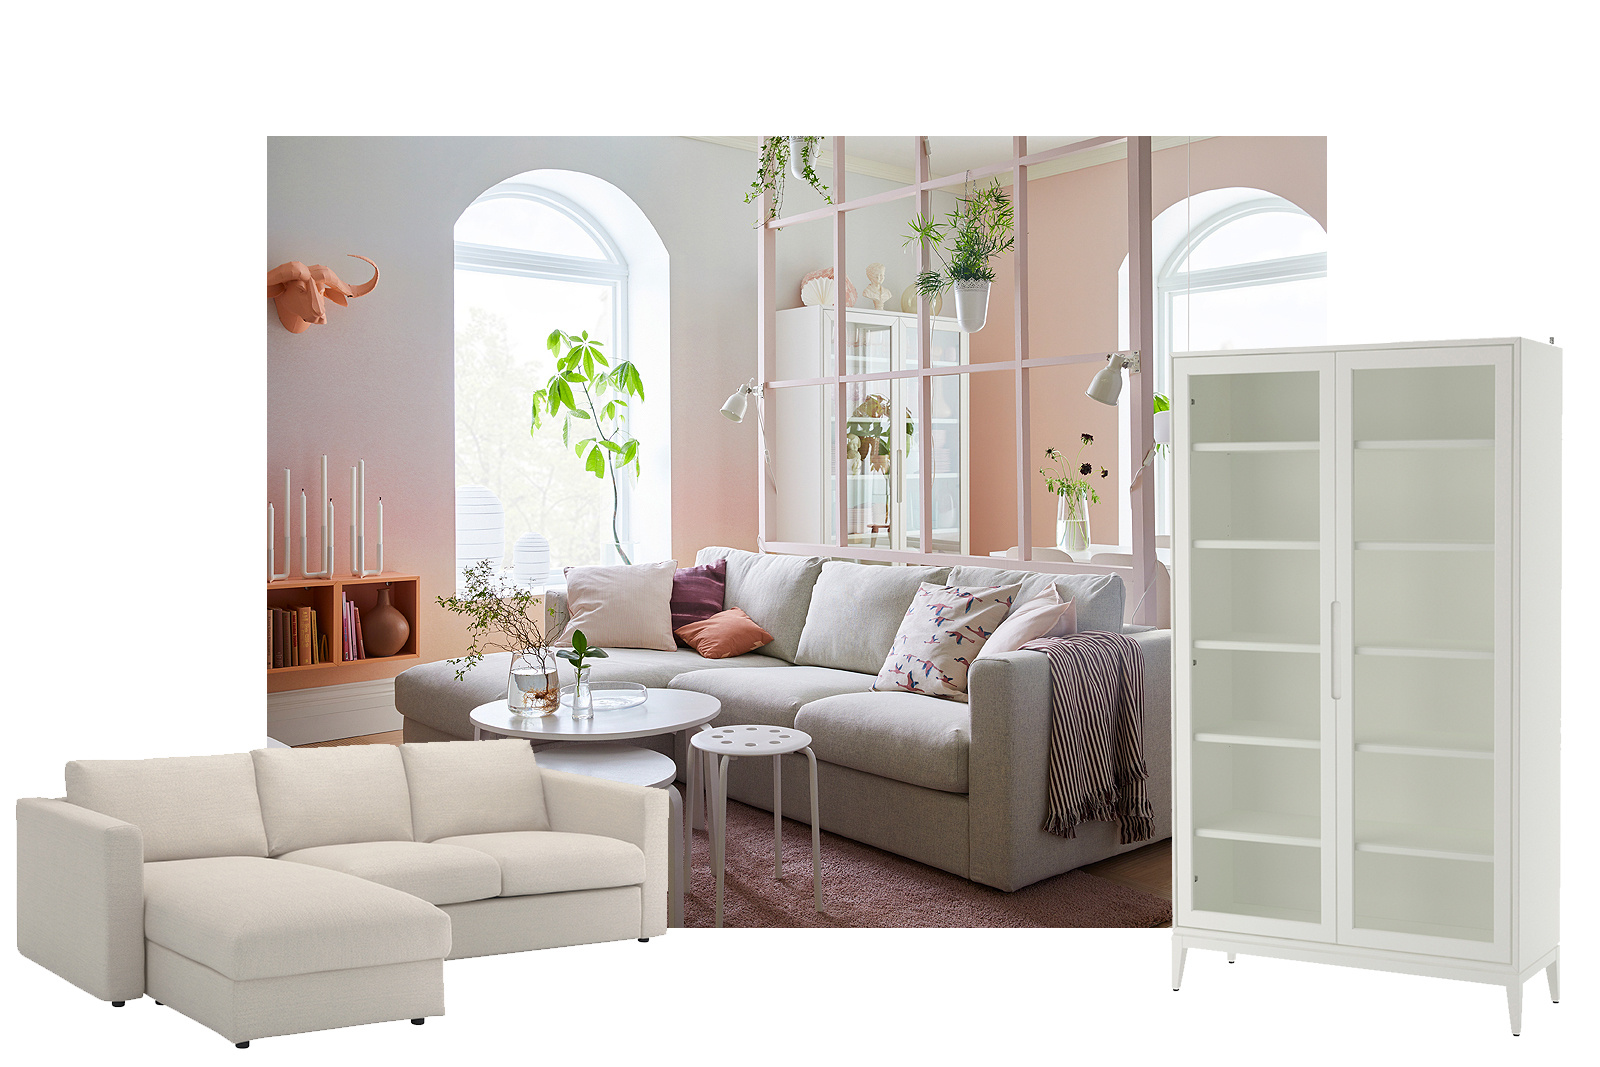 galeriaefka salon IKEA